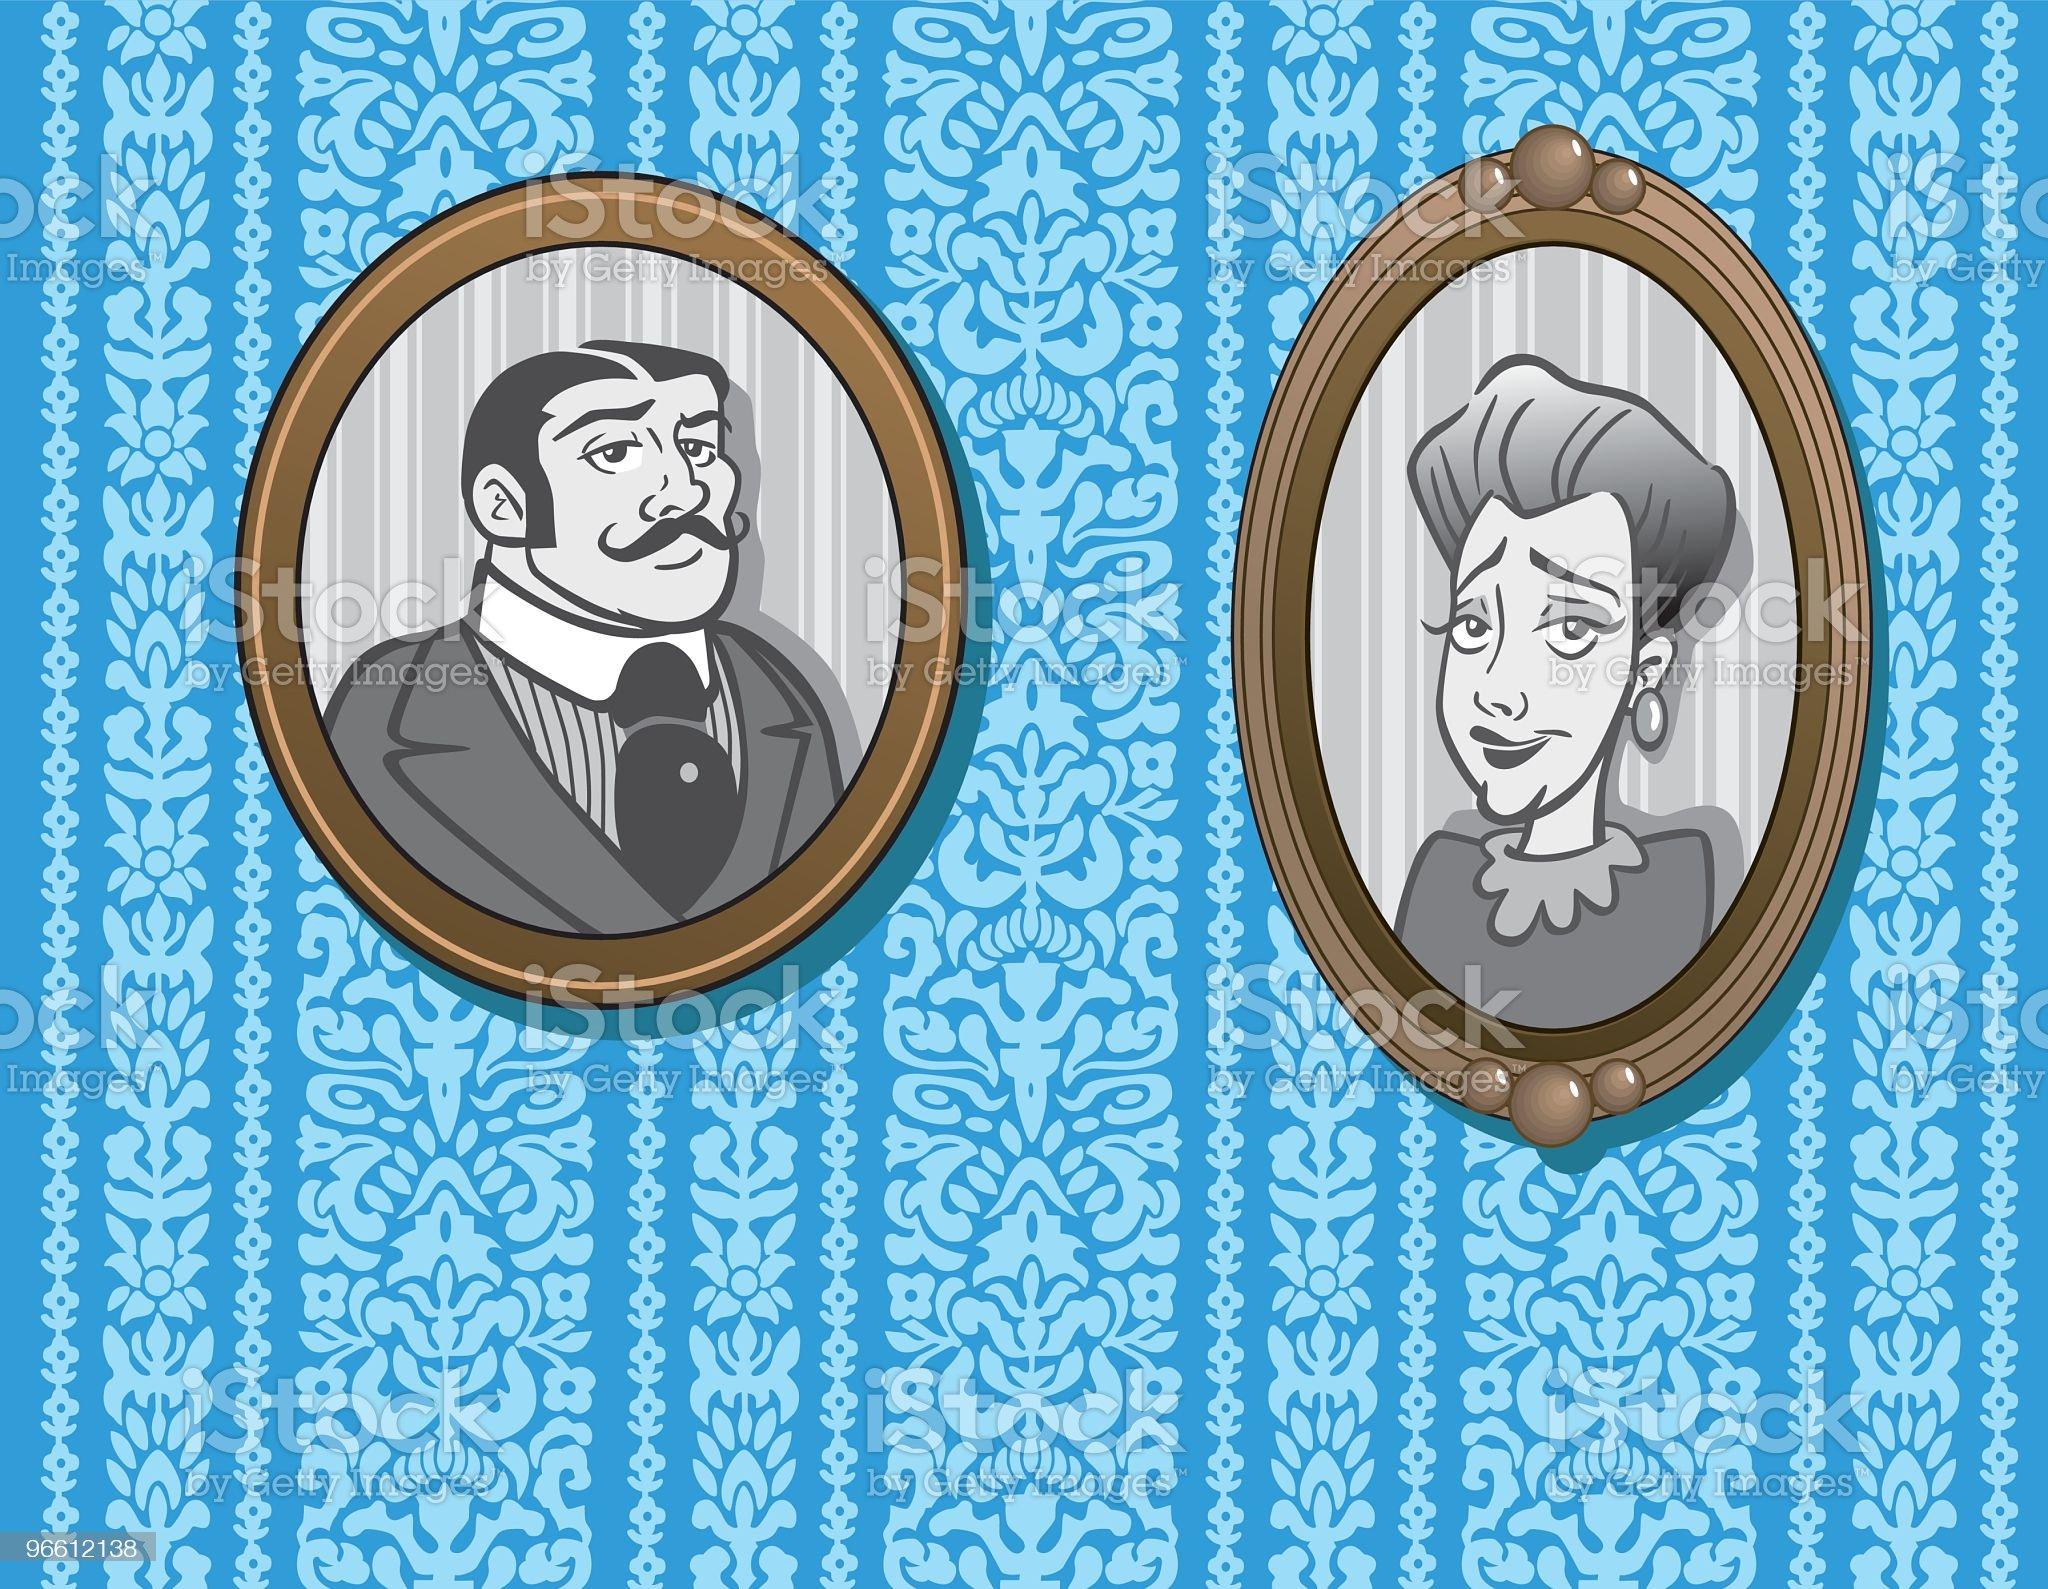 Victorian Wallpaper royalty-free stock vector art